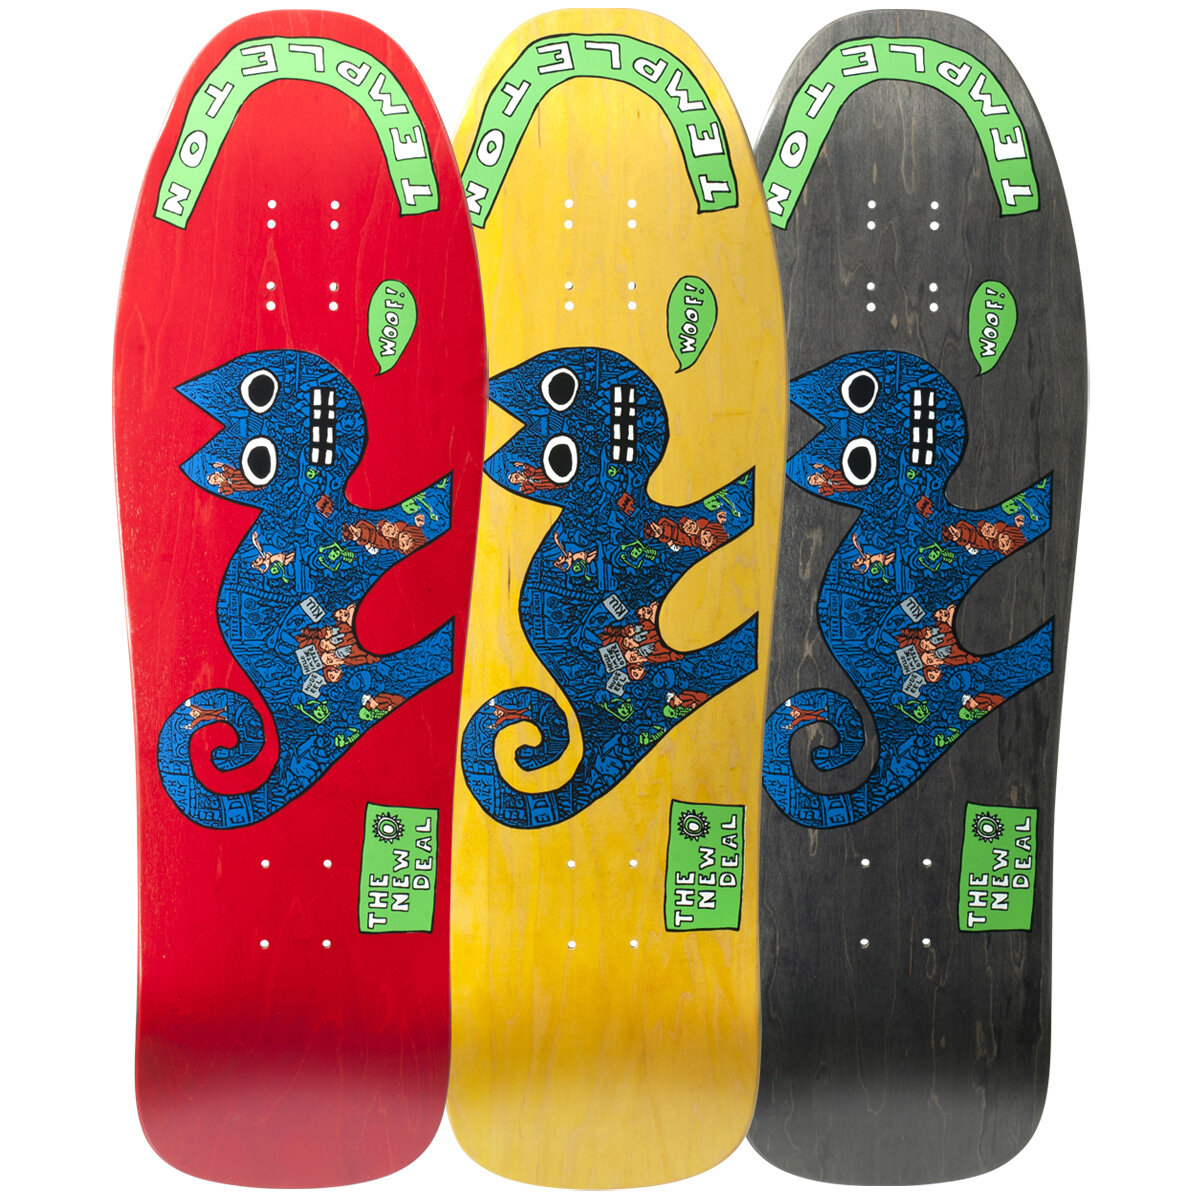 New_Deal_Skateboards_Ed_Templeton_cat_screen_printed_deck.jpg